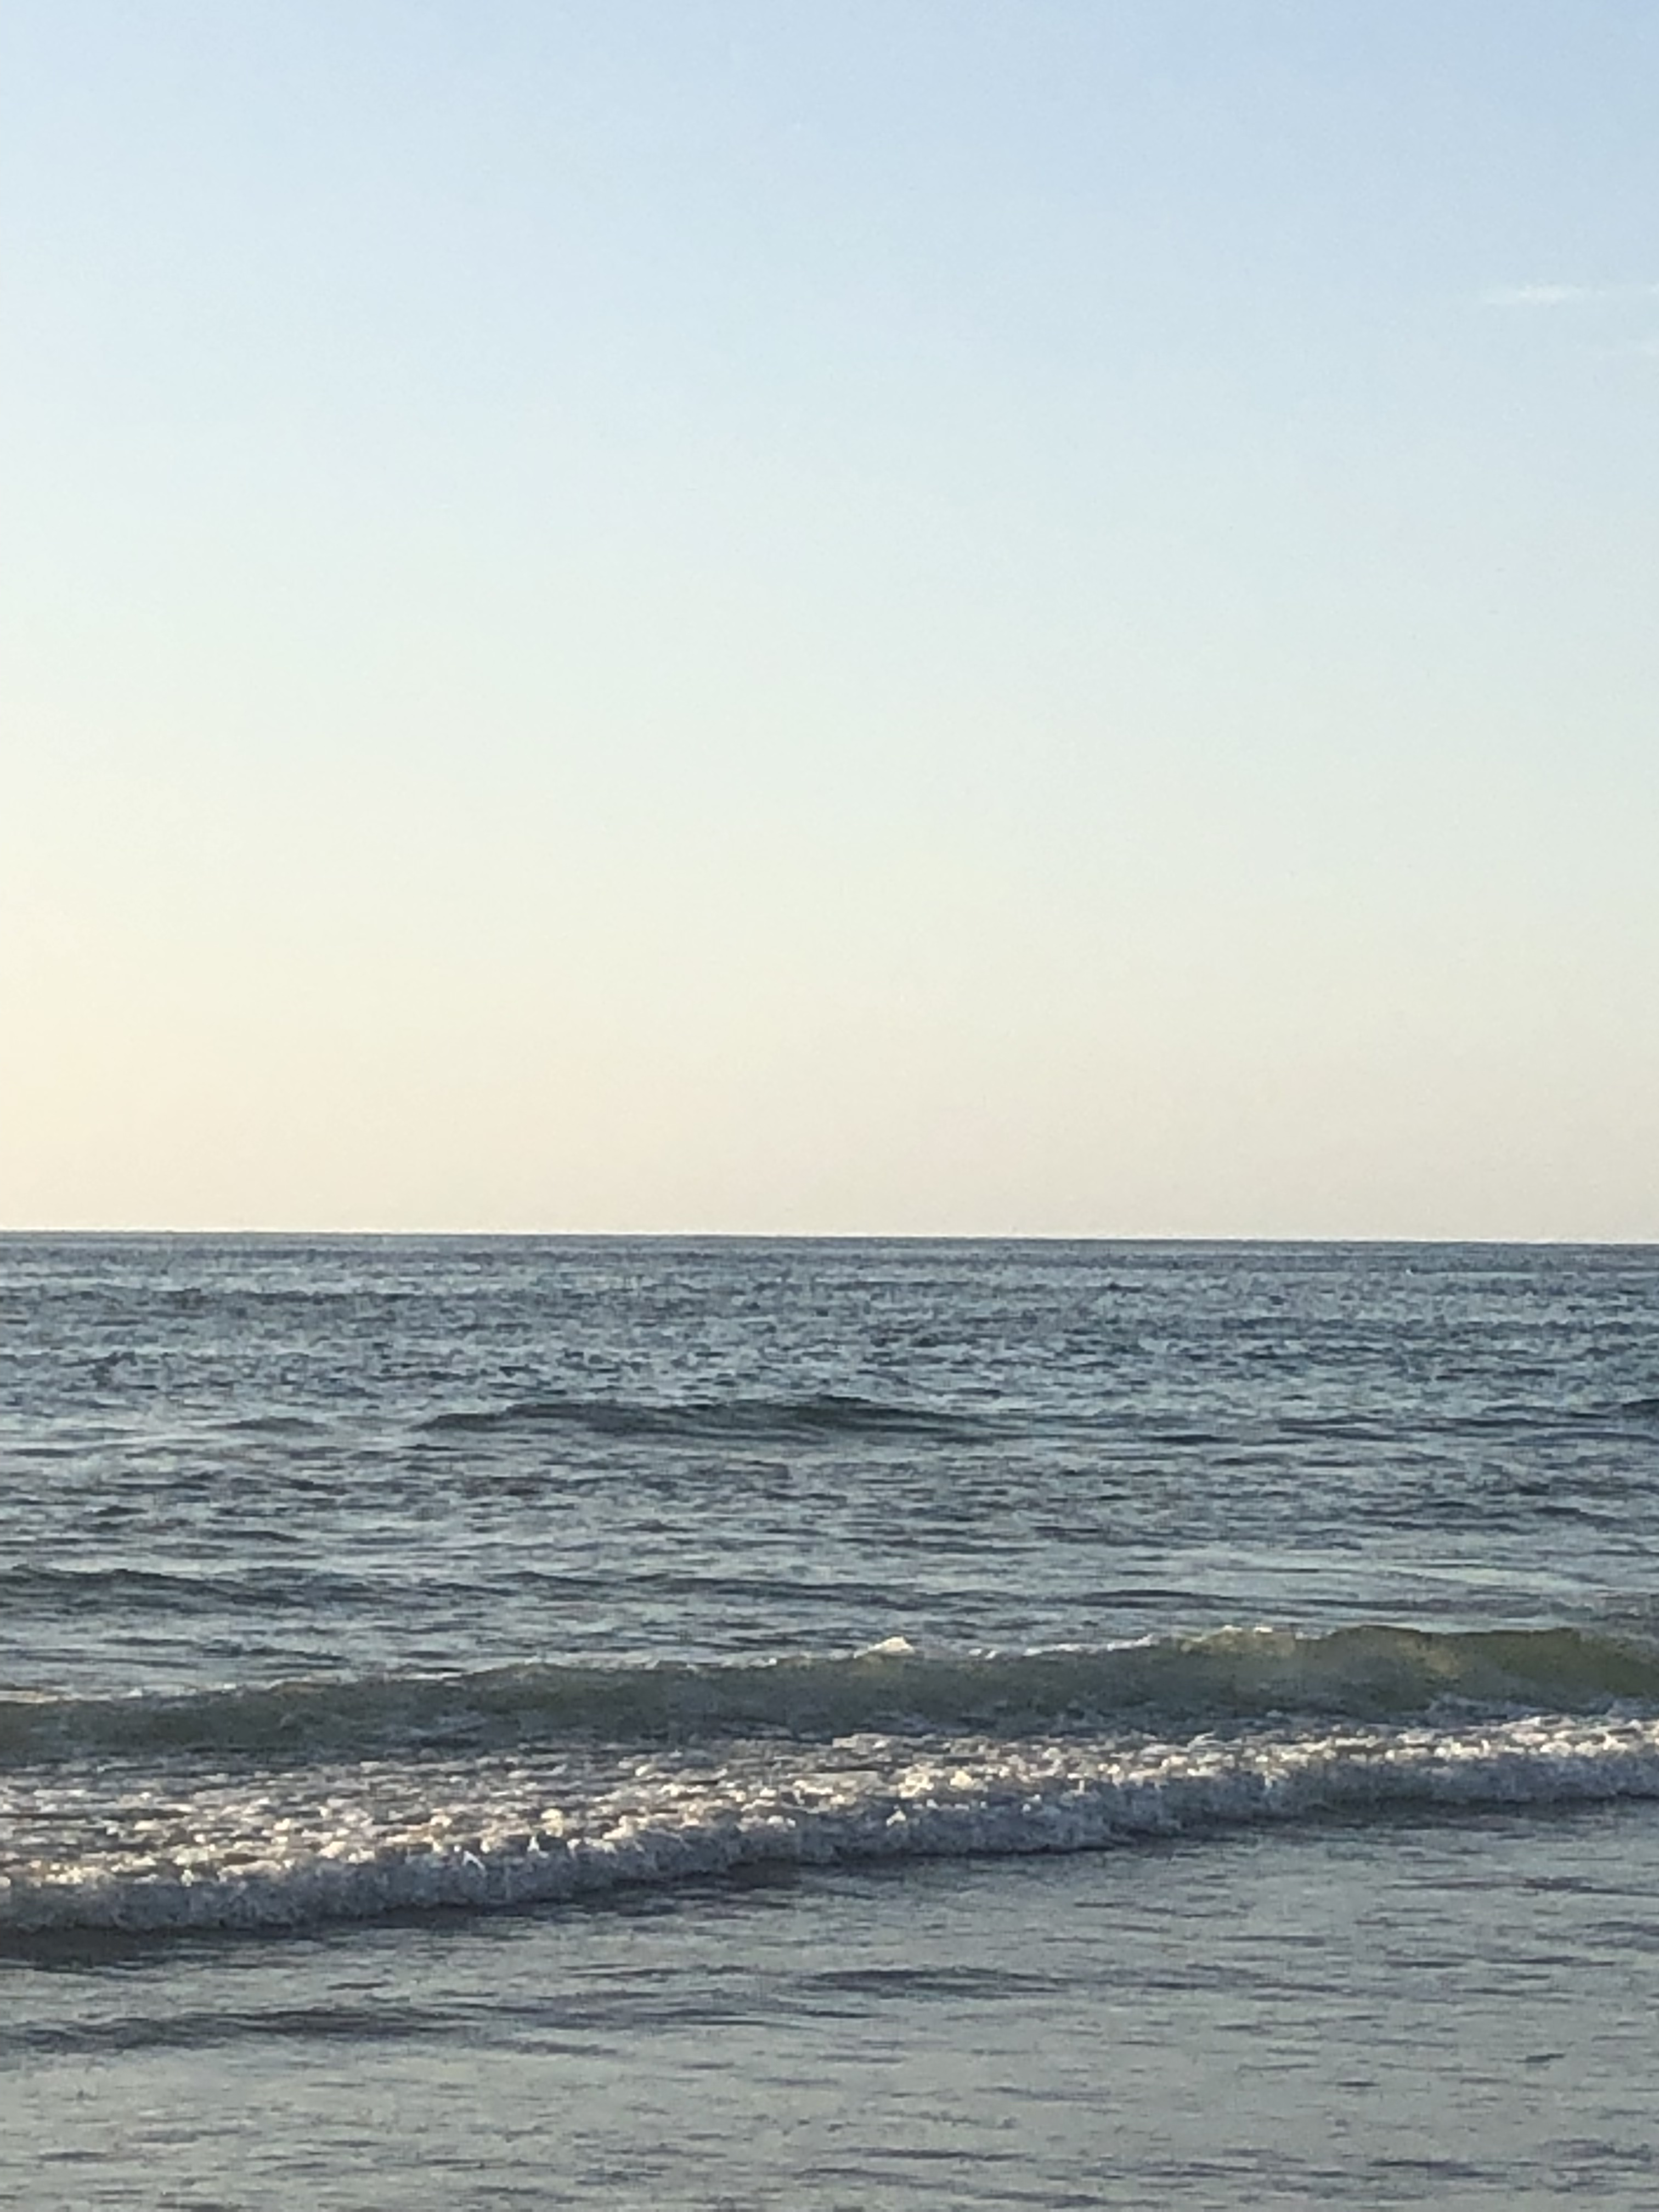 ocean waves crawling into shore